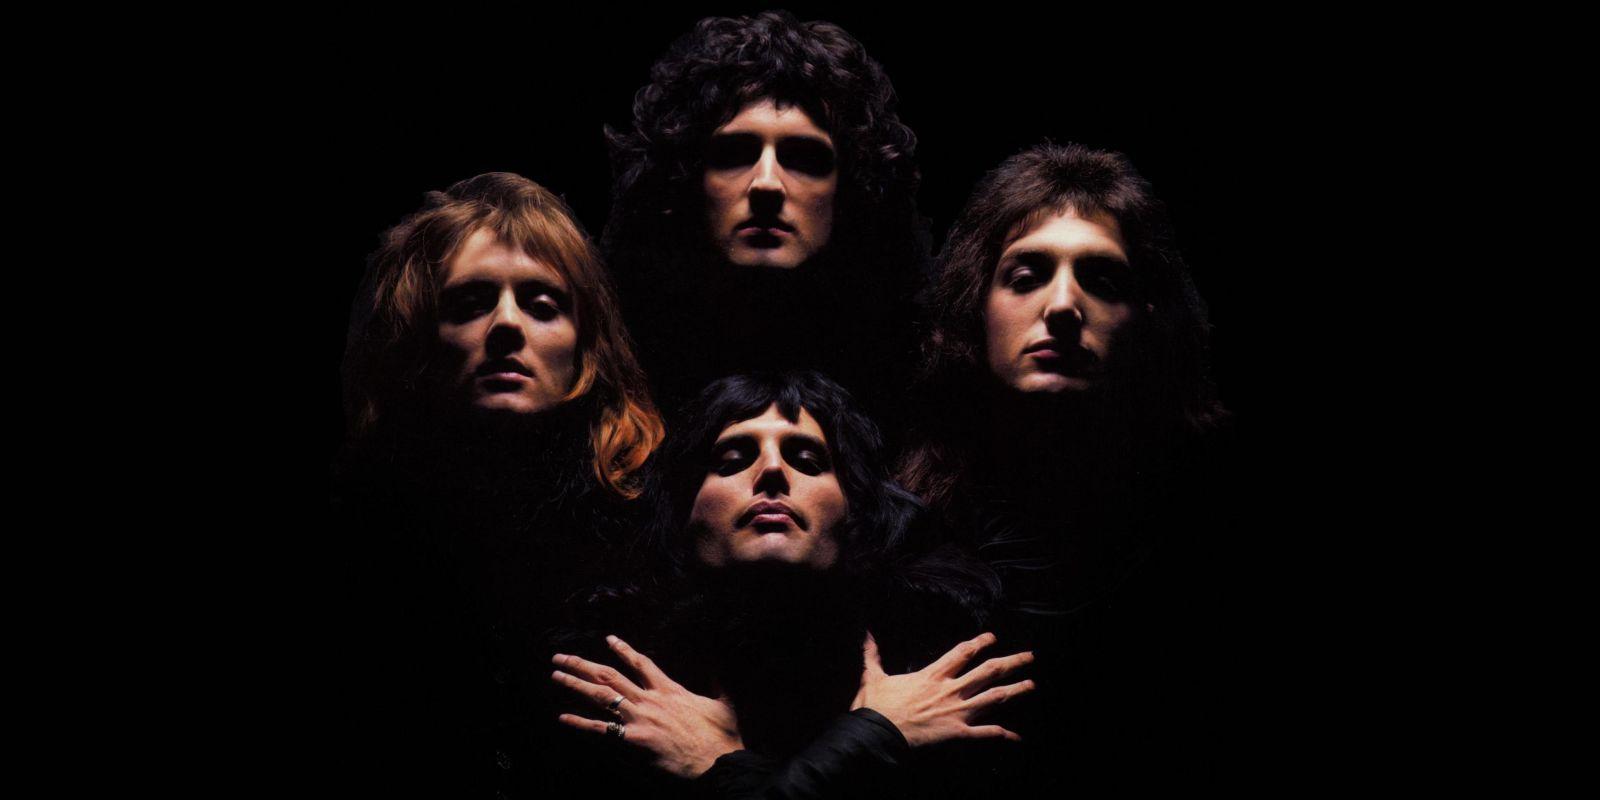 [VIDEO] Crowd sings Bohemian Rhapsody before a Green Day concert in London